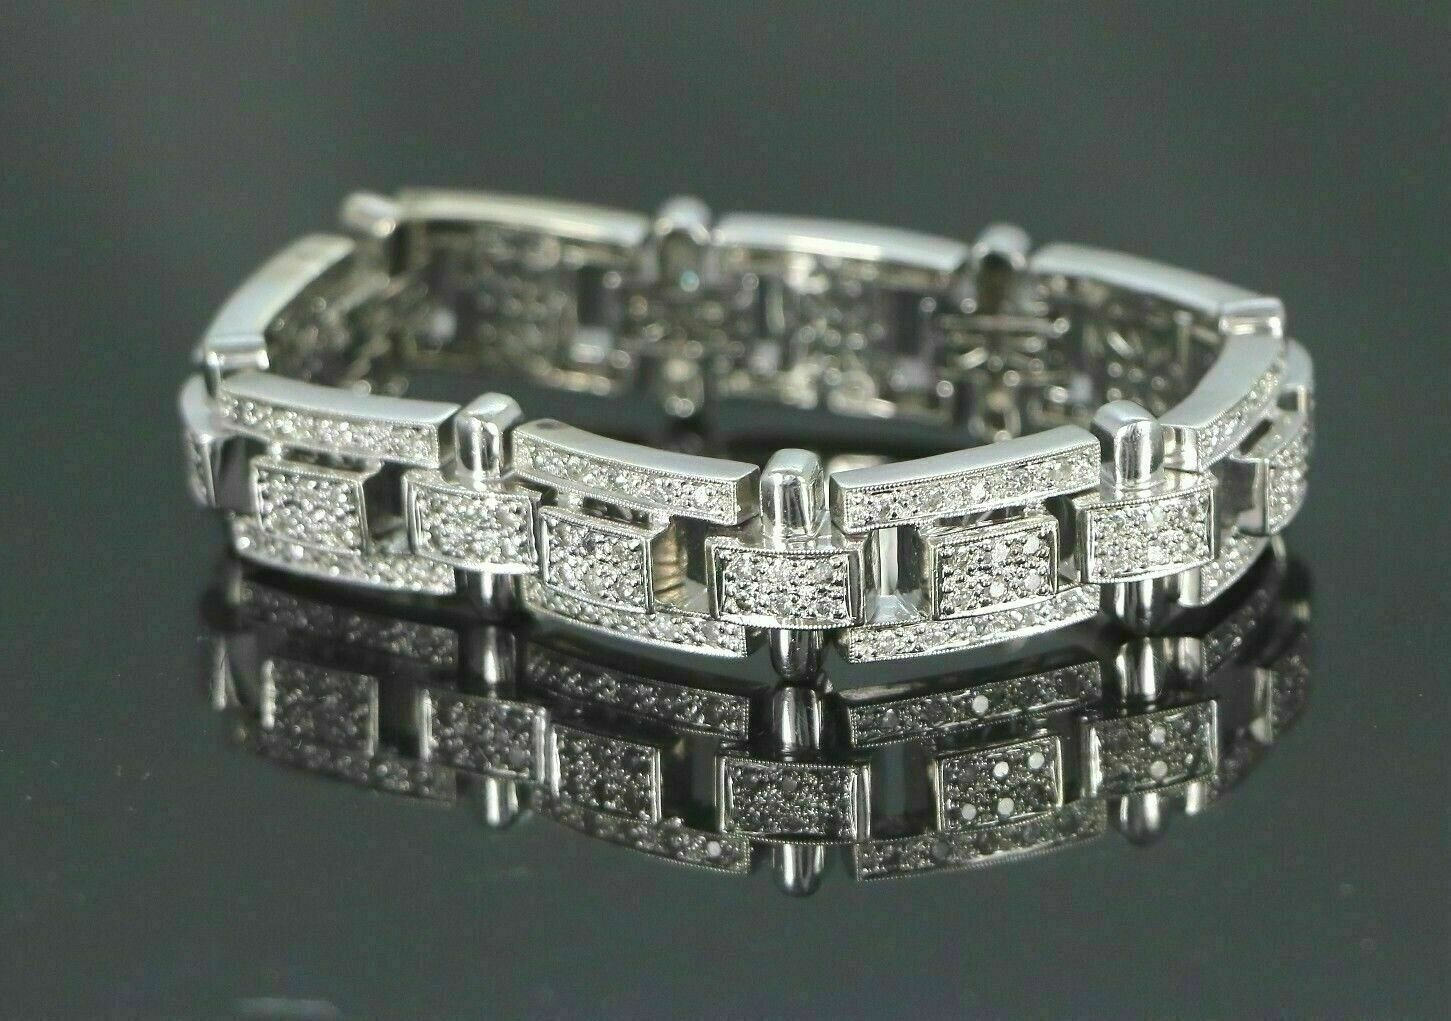 13.25Ct Round Cut Diamond 14K White Gold Over Men's Exclusive Tennis Bracelet 4